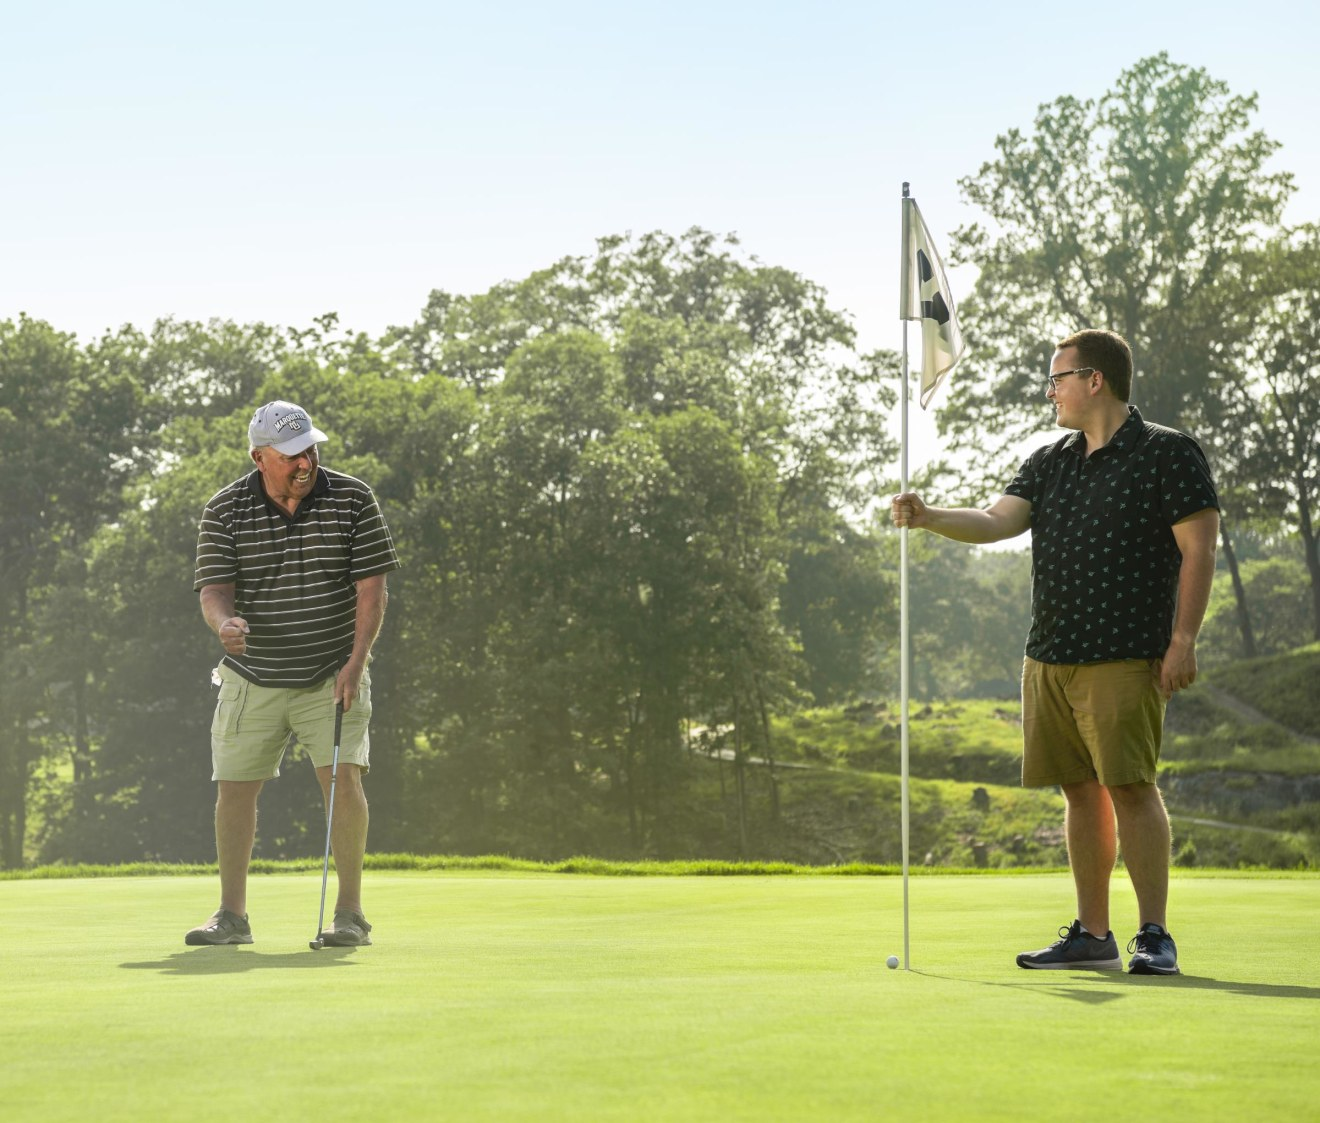 Joe golfing with son